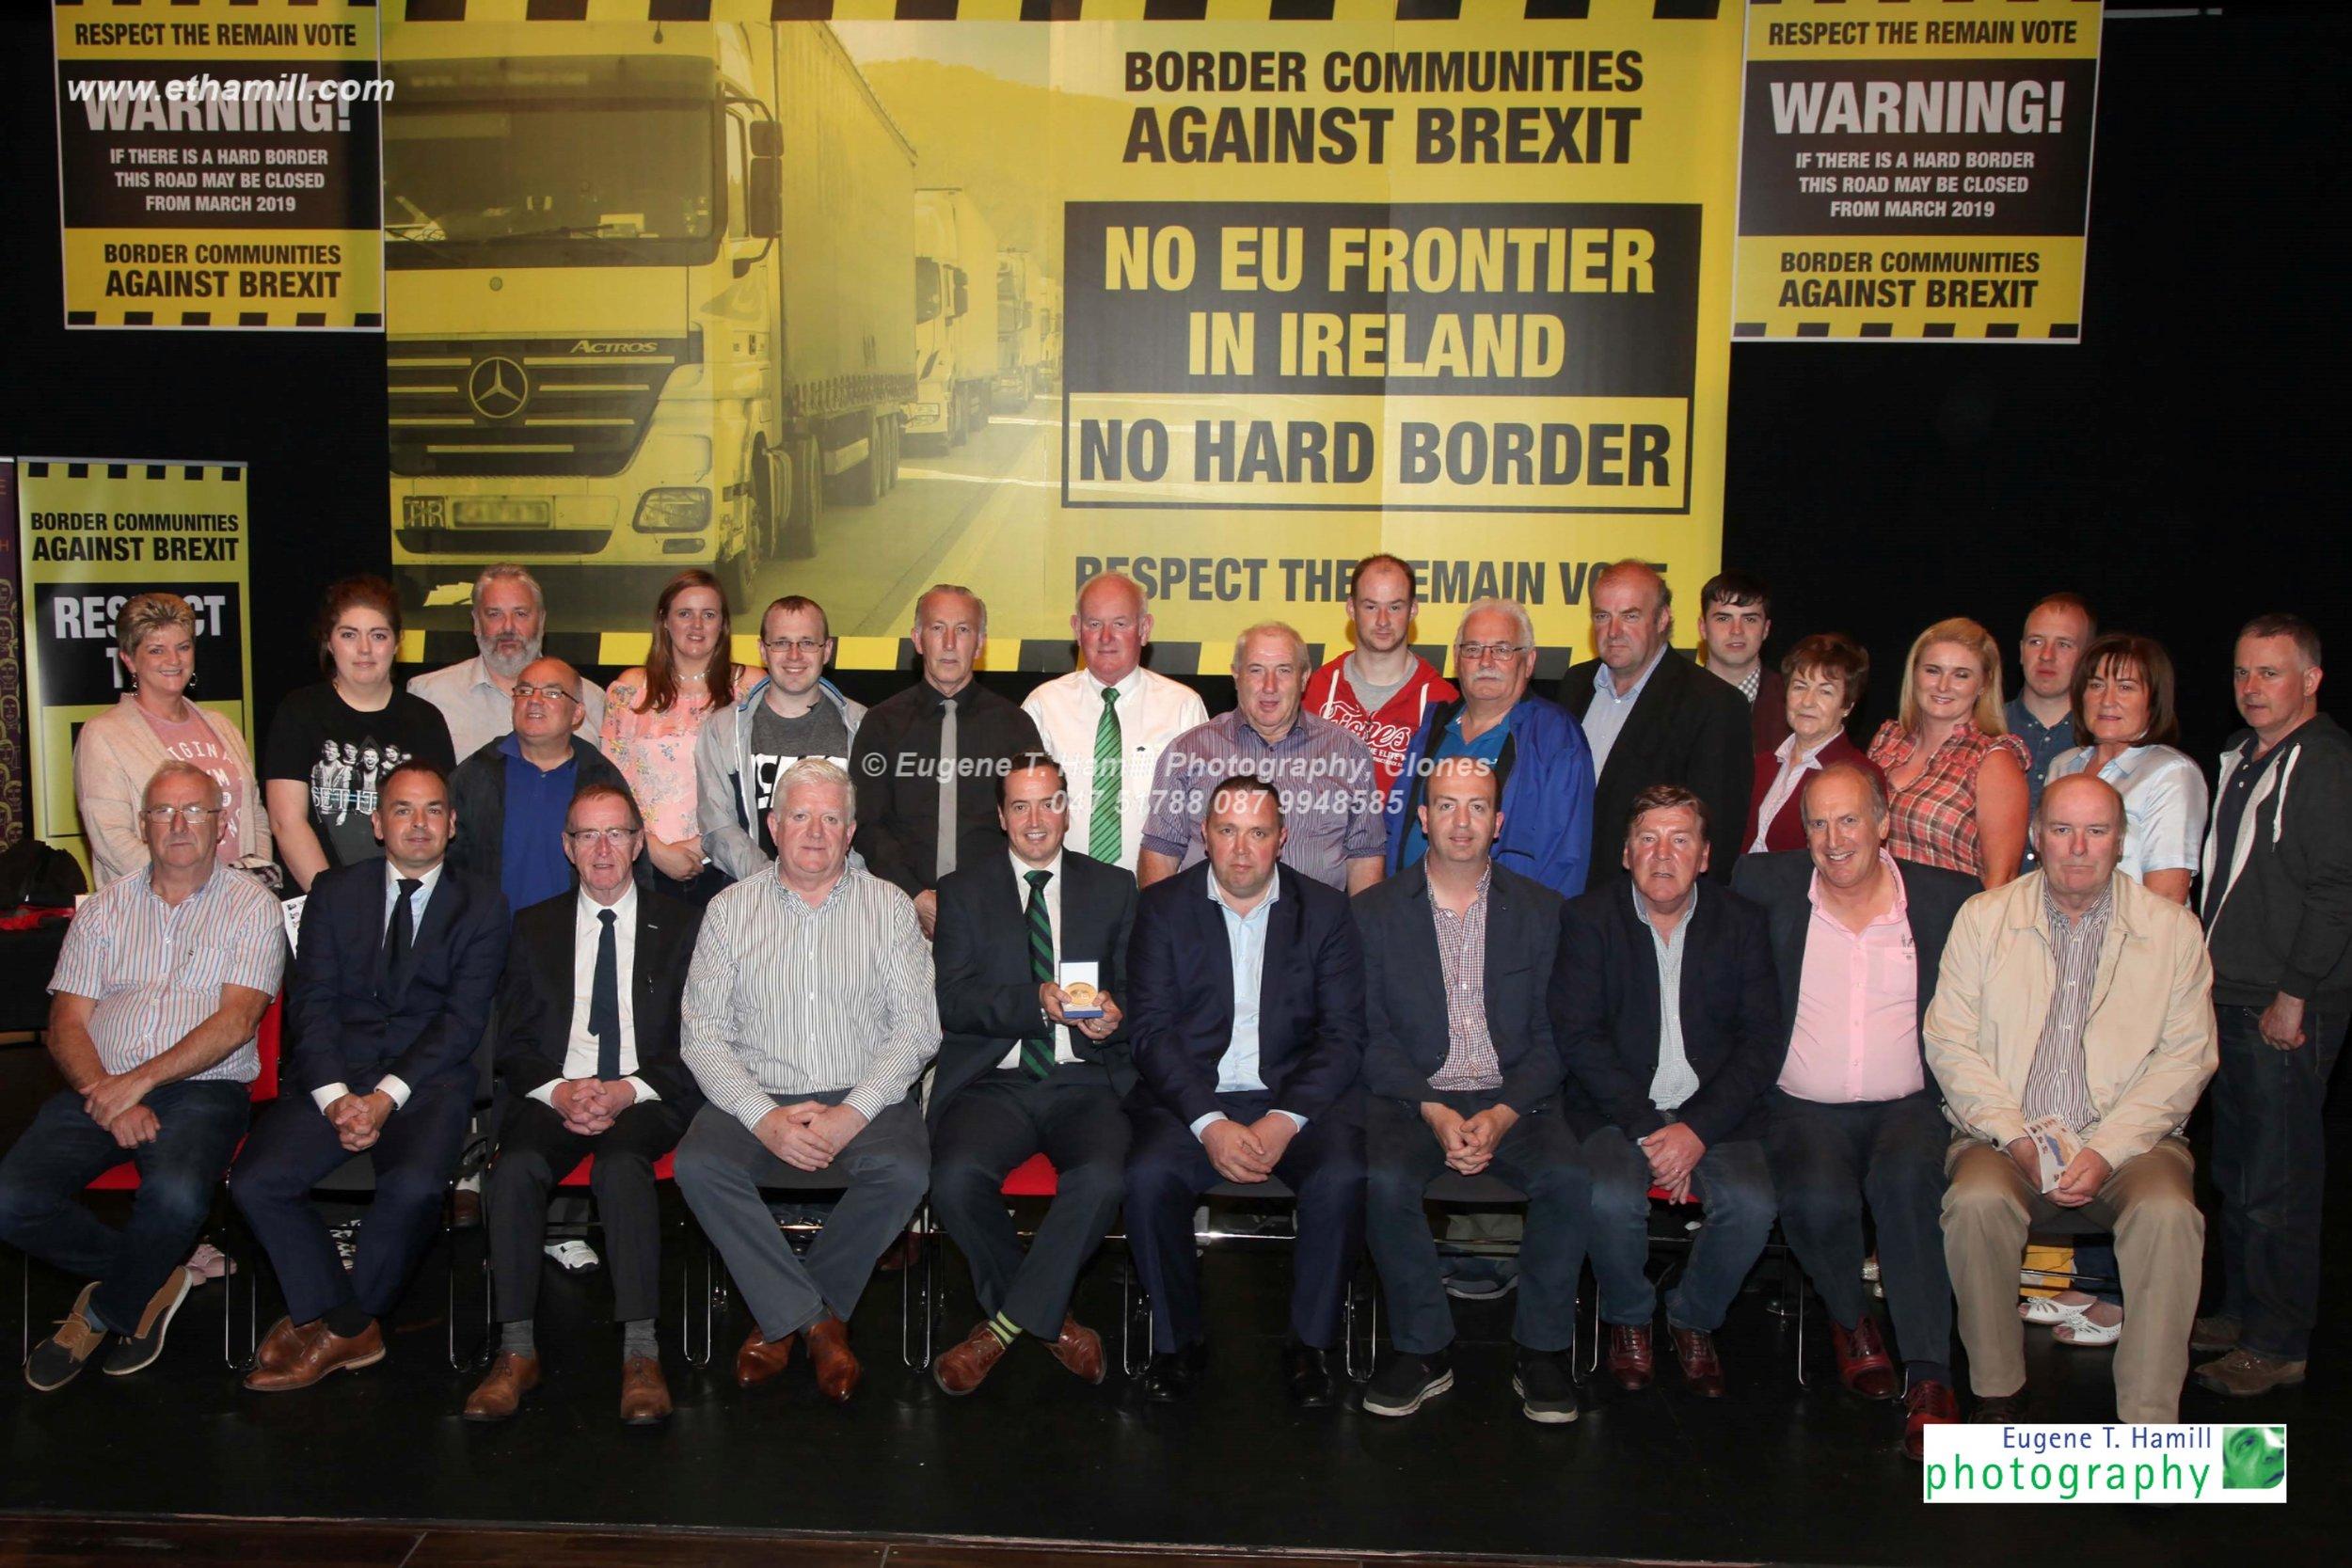 border communities against brexit winners of european citizen award .jpg